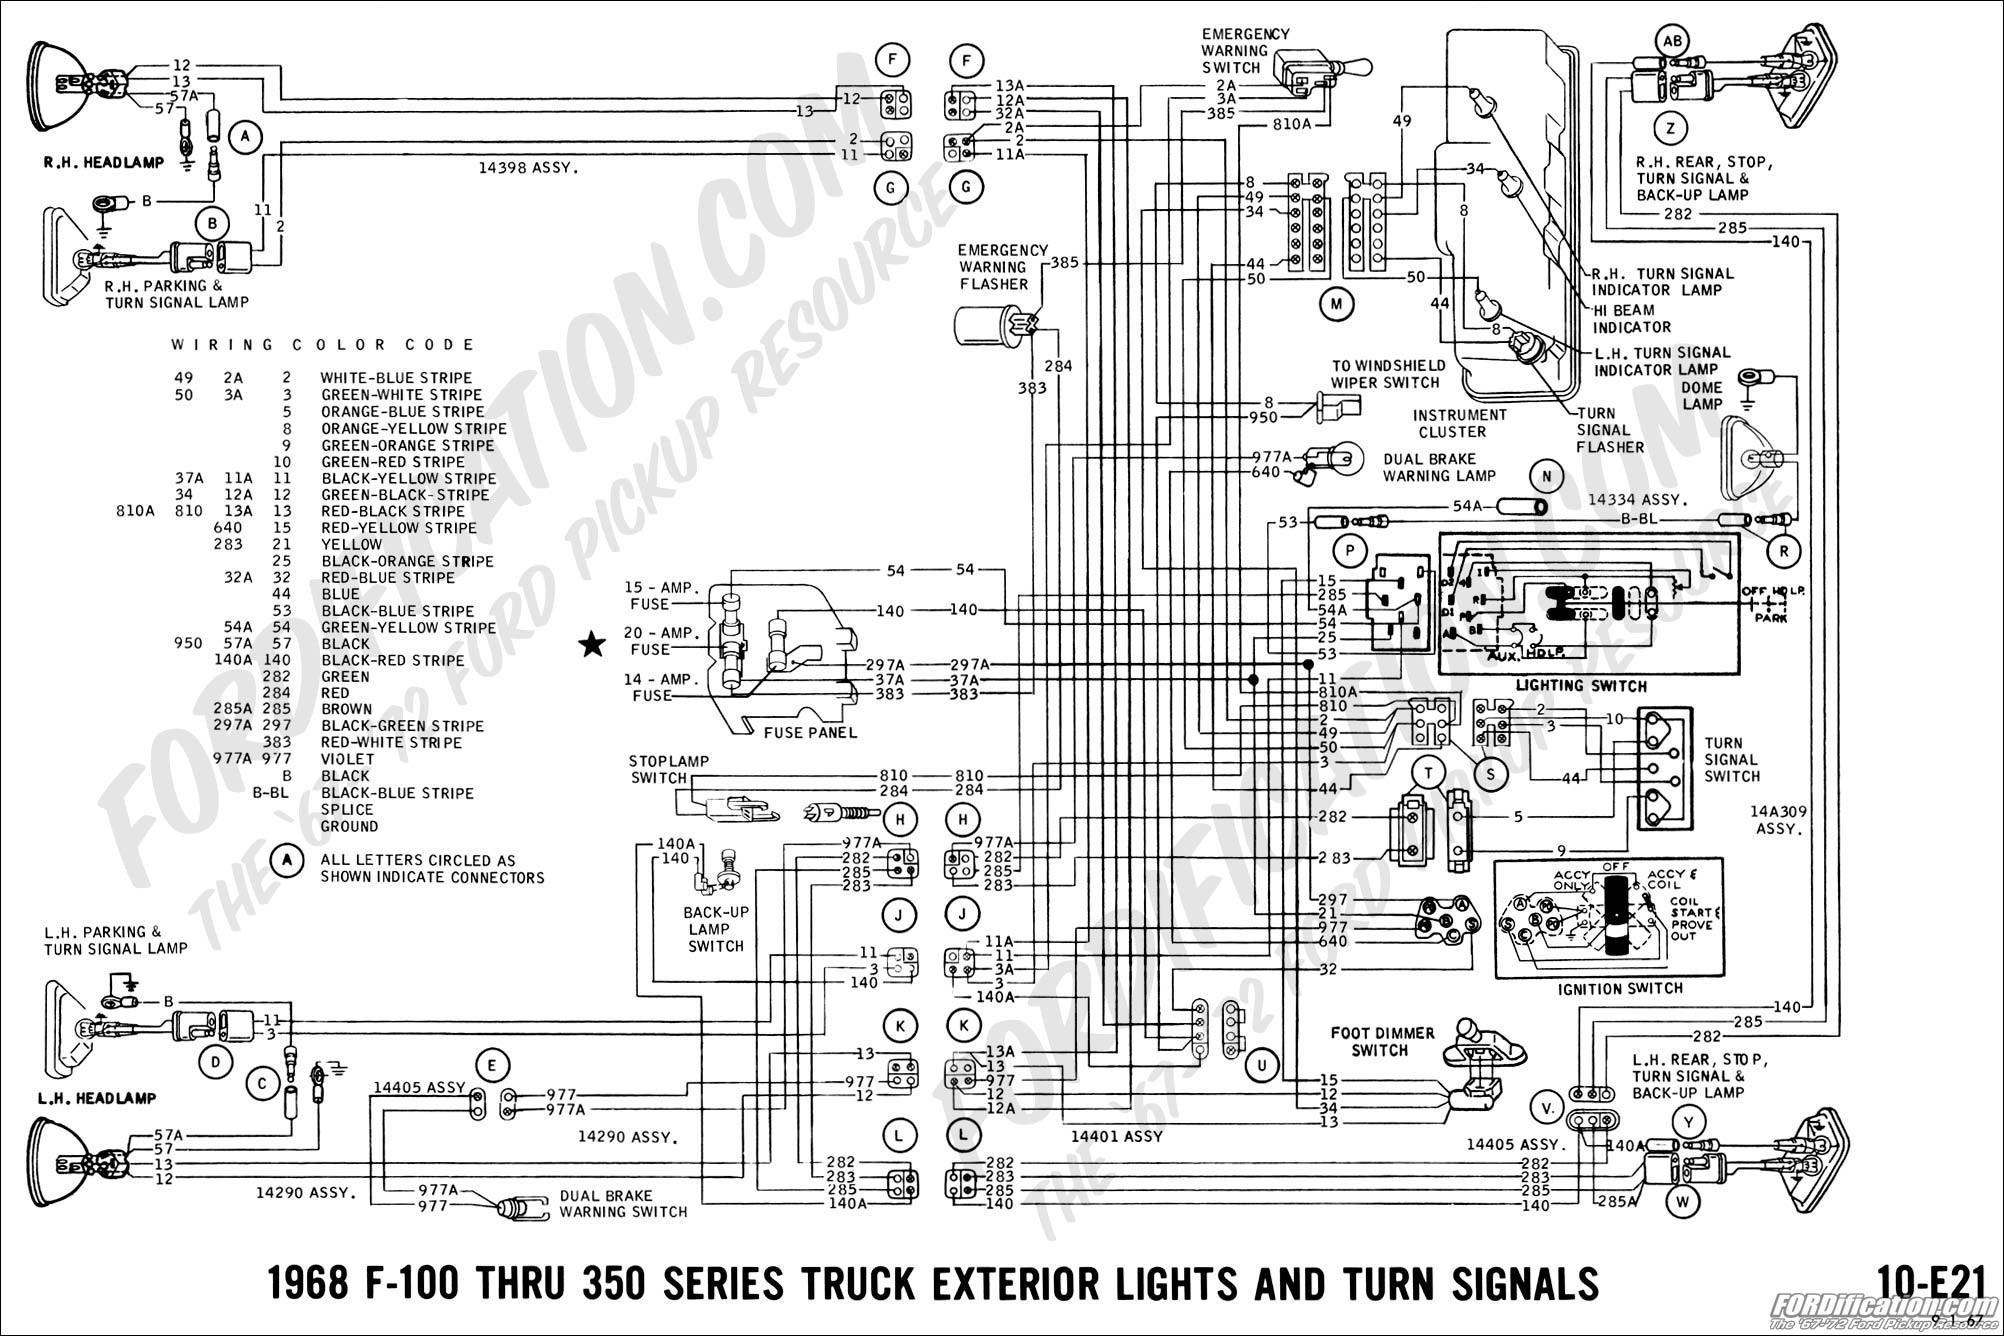 Alternator wiring diagram chevy ci motorhome wiring diagram best gm alternator wiring diagram chevy 1965 ford f100 alternator wiring diagram wiring diagram of alternator wiring diagram asfbconference2016 Gallery